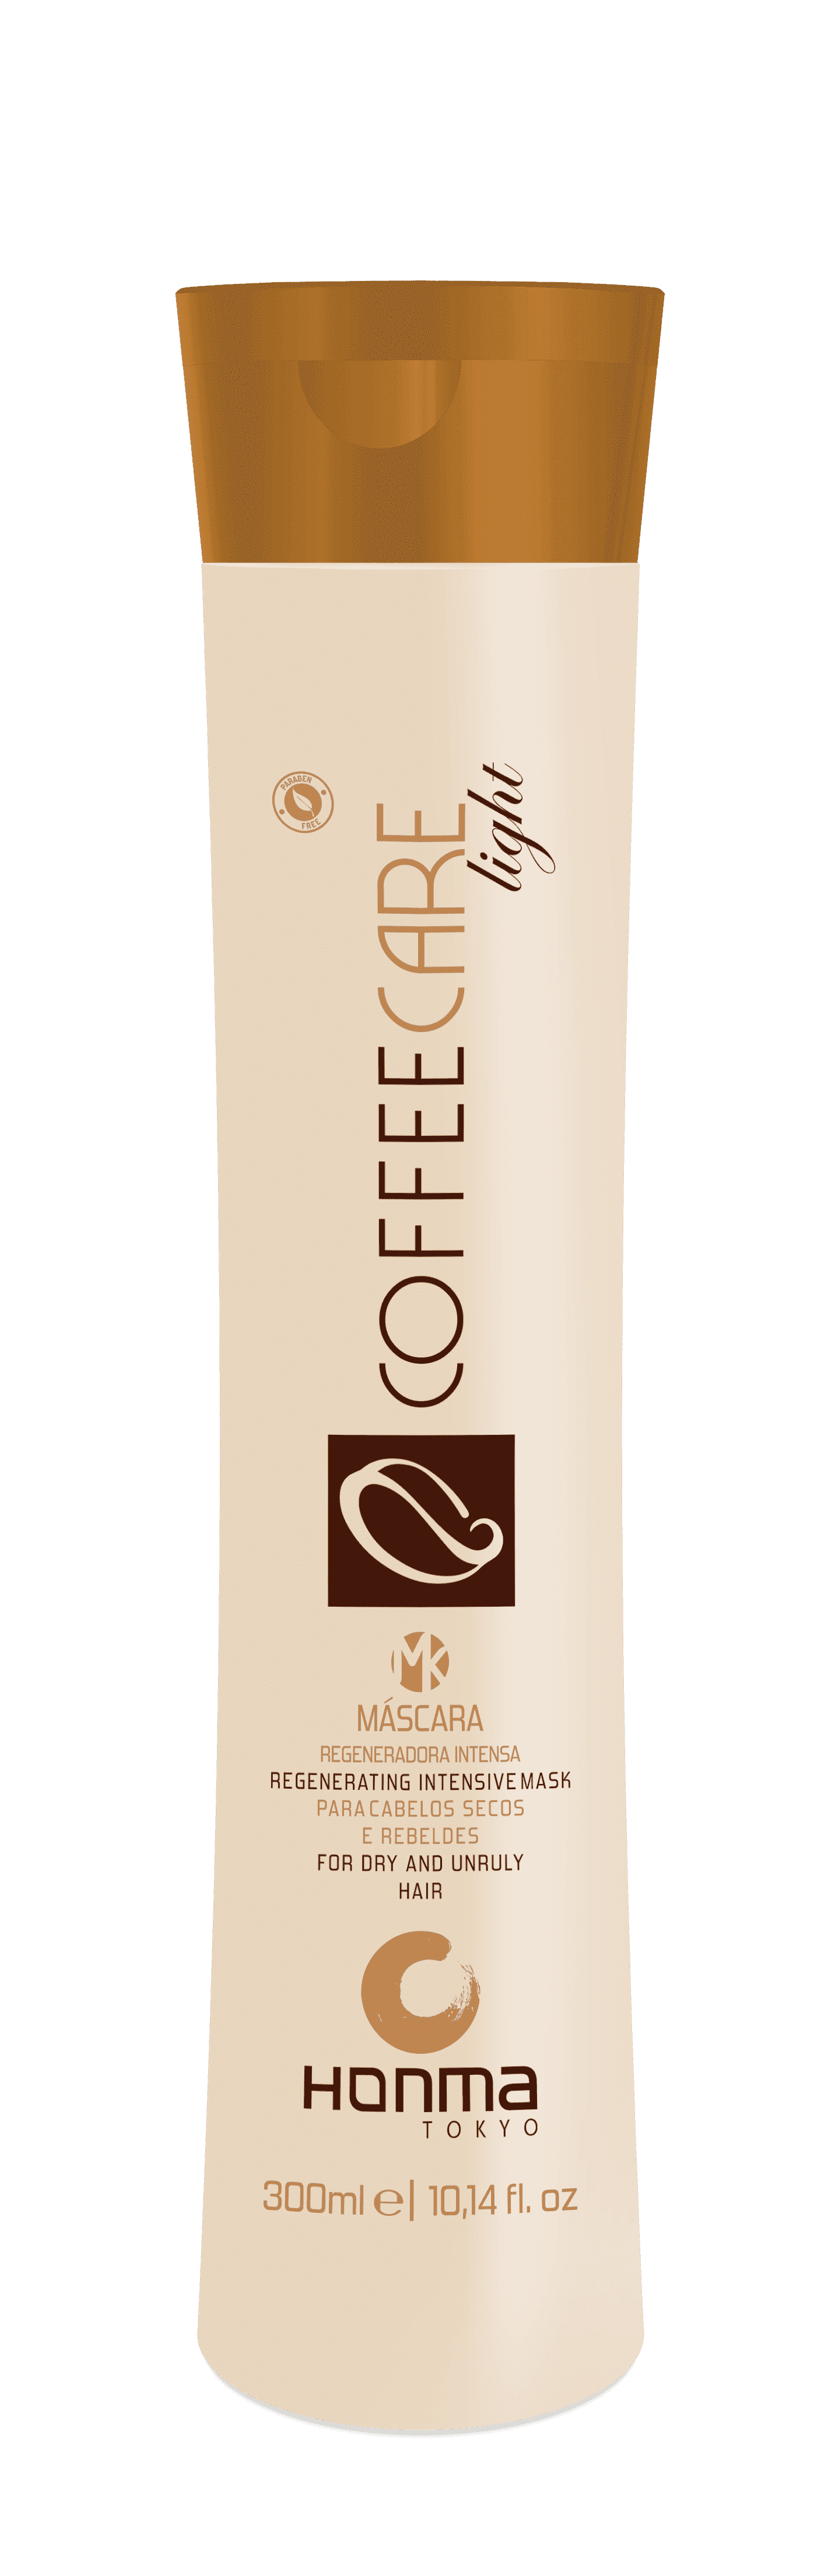 Coffee Care Light Восстанавливающая интенсивная маска питание и укрепление, 300 мл